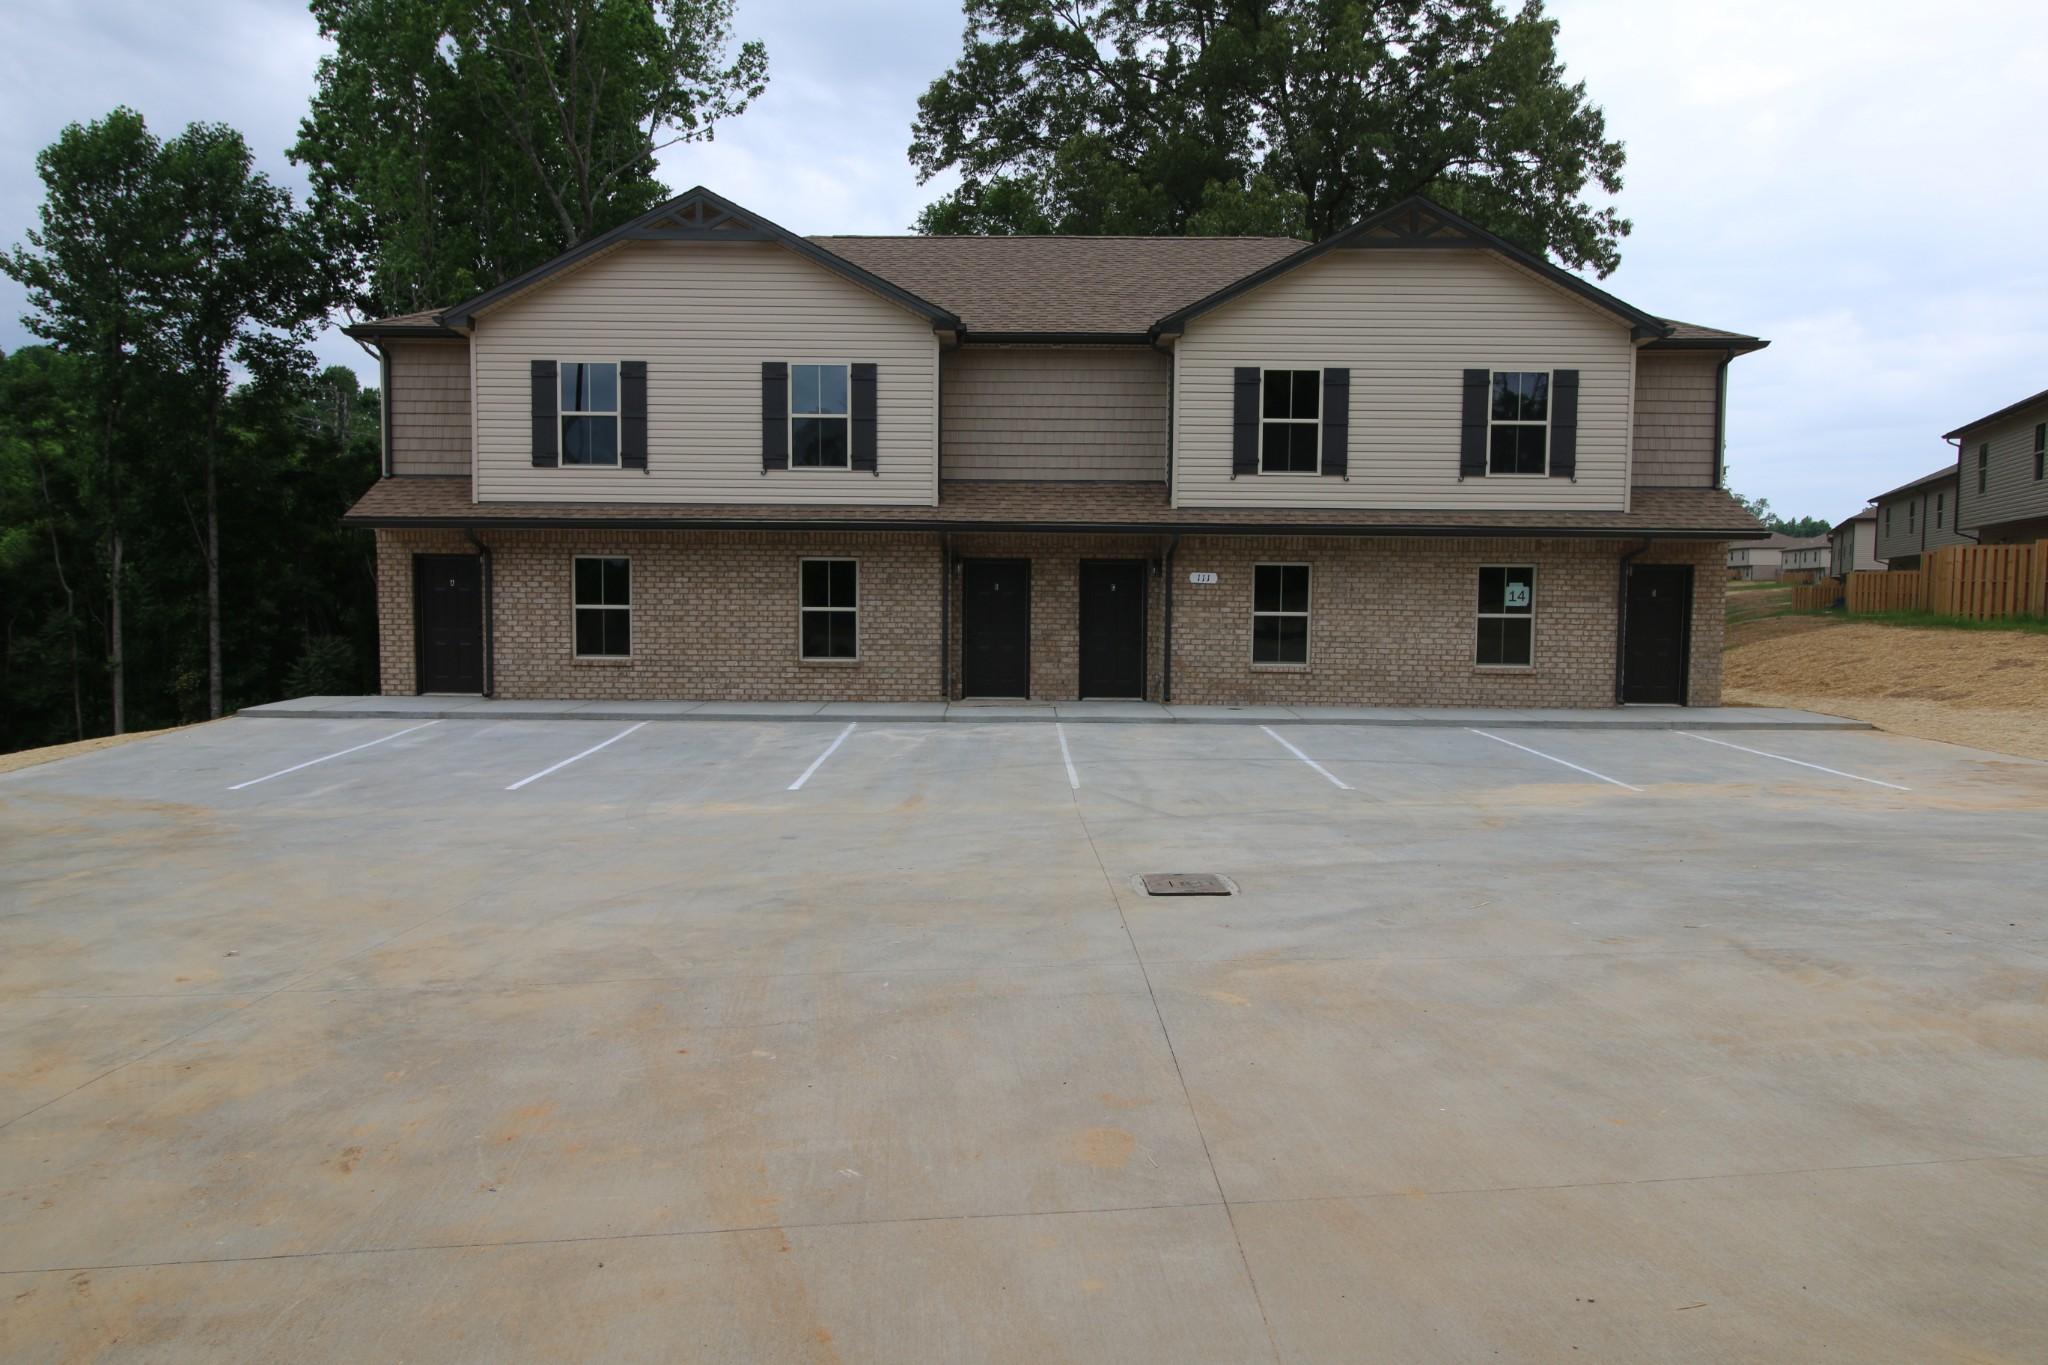 14 Flint Ridge Property Photo - Clarksville, TN real estate listing